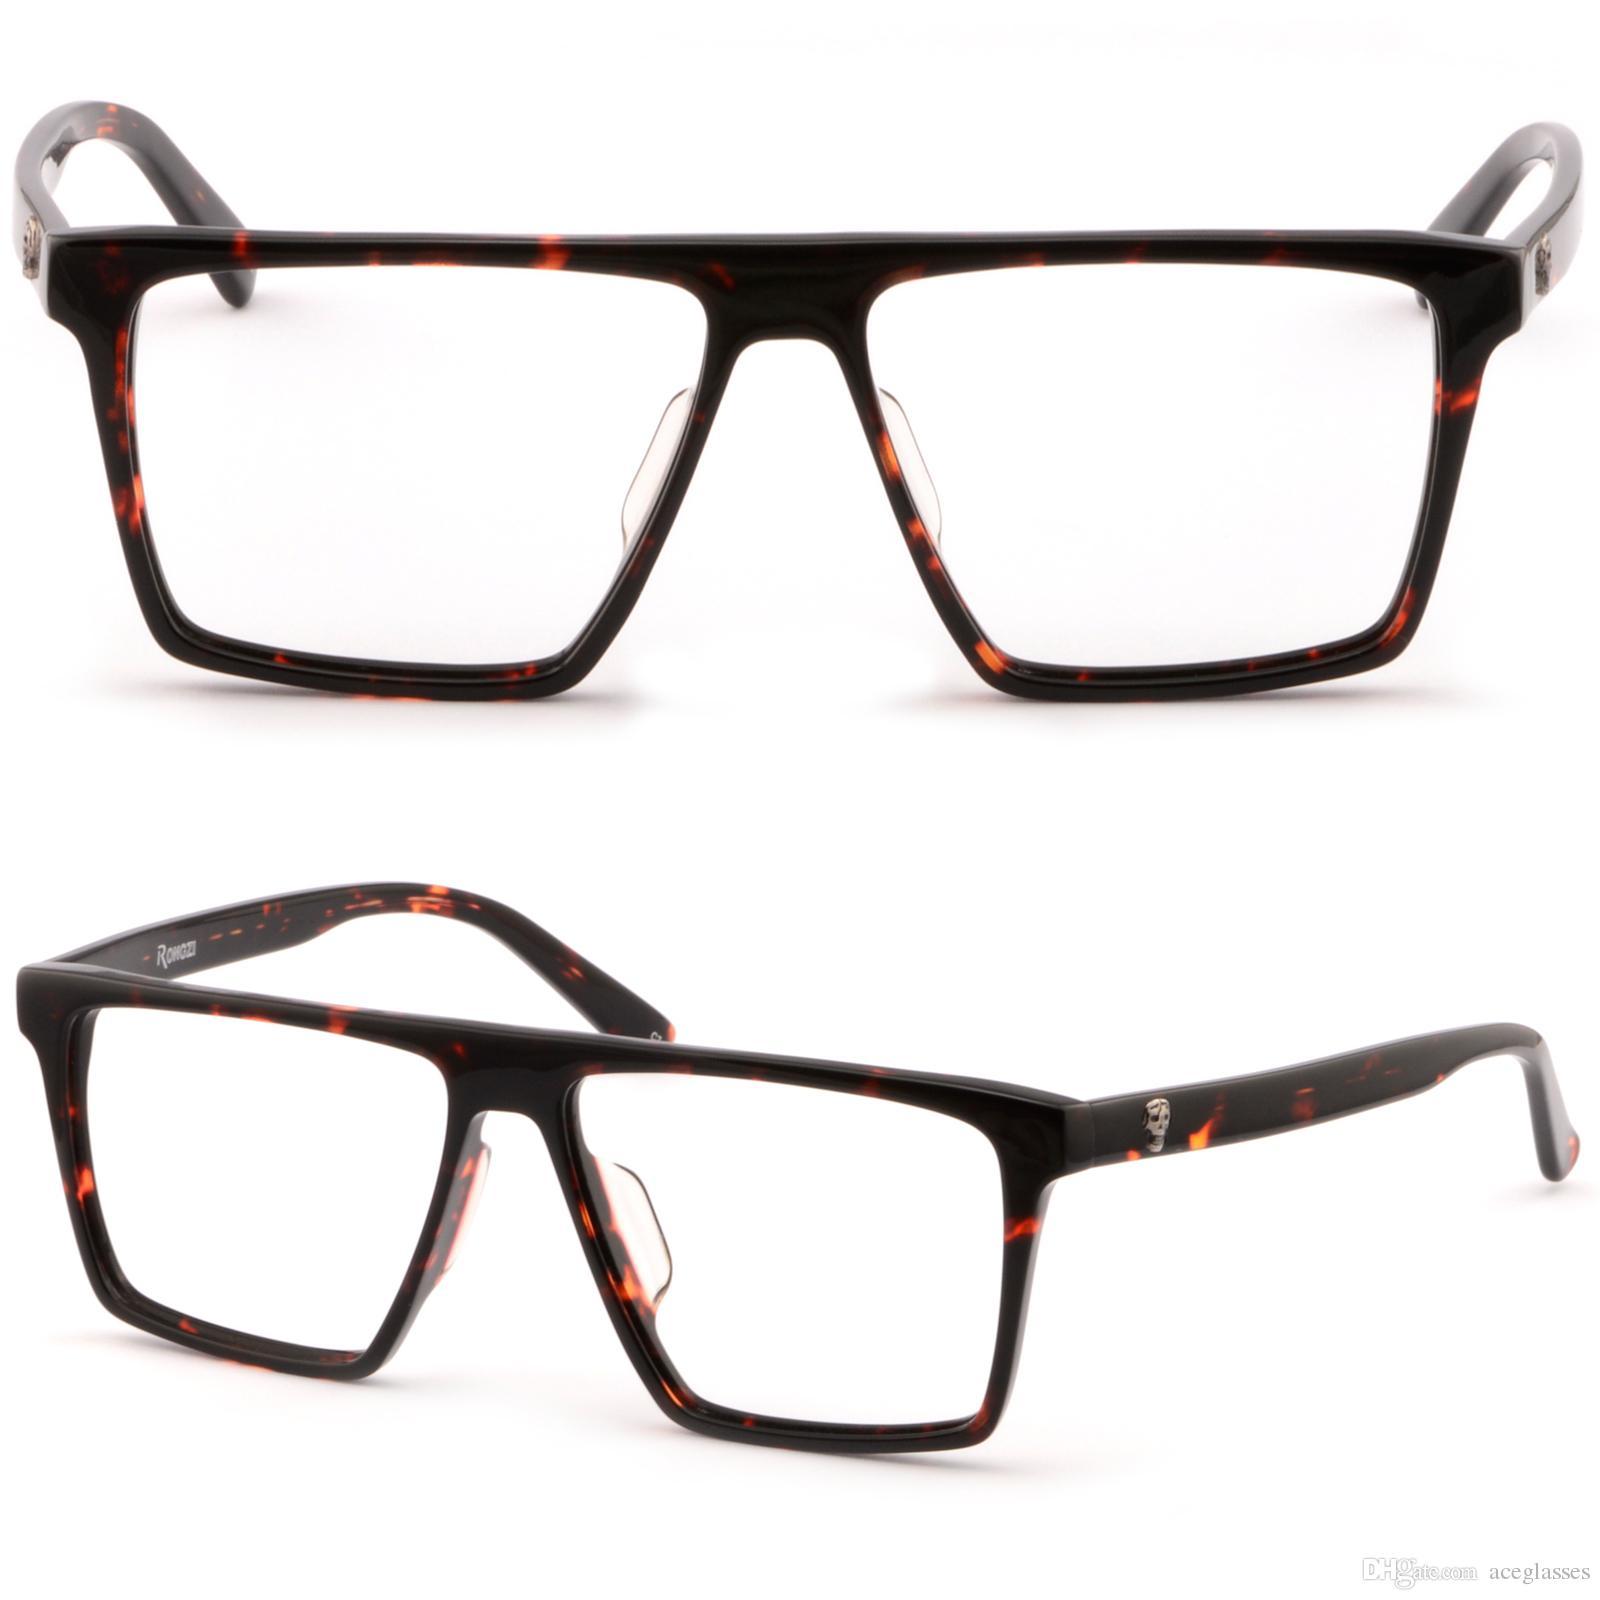 Large Square Plastic Frame Big Men Prescription Glasses Sunglasses ...